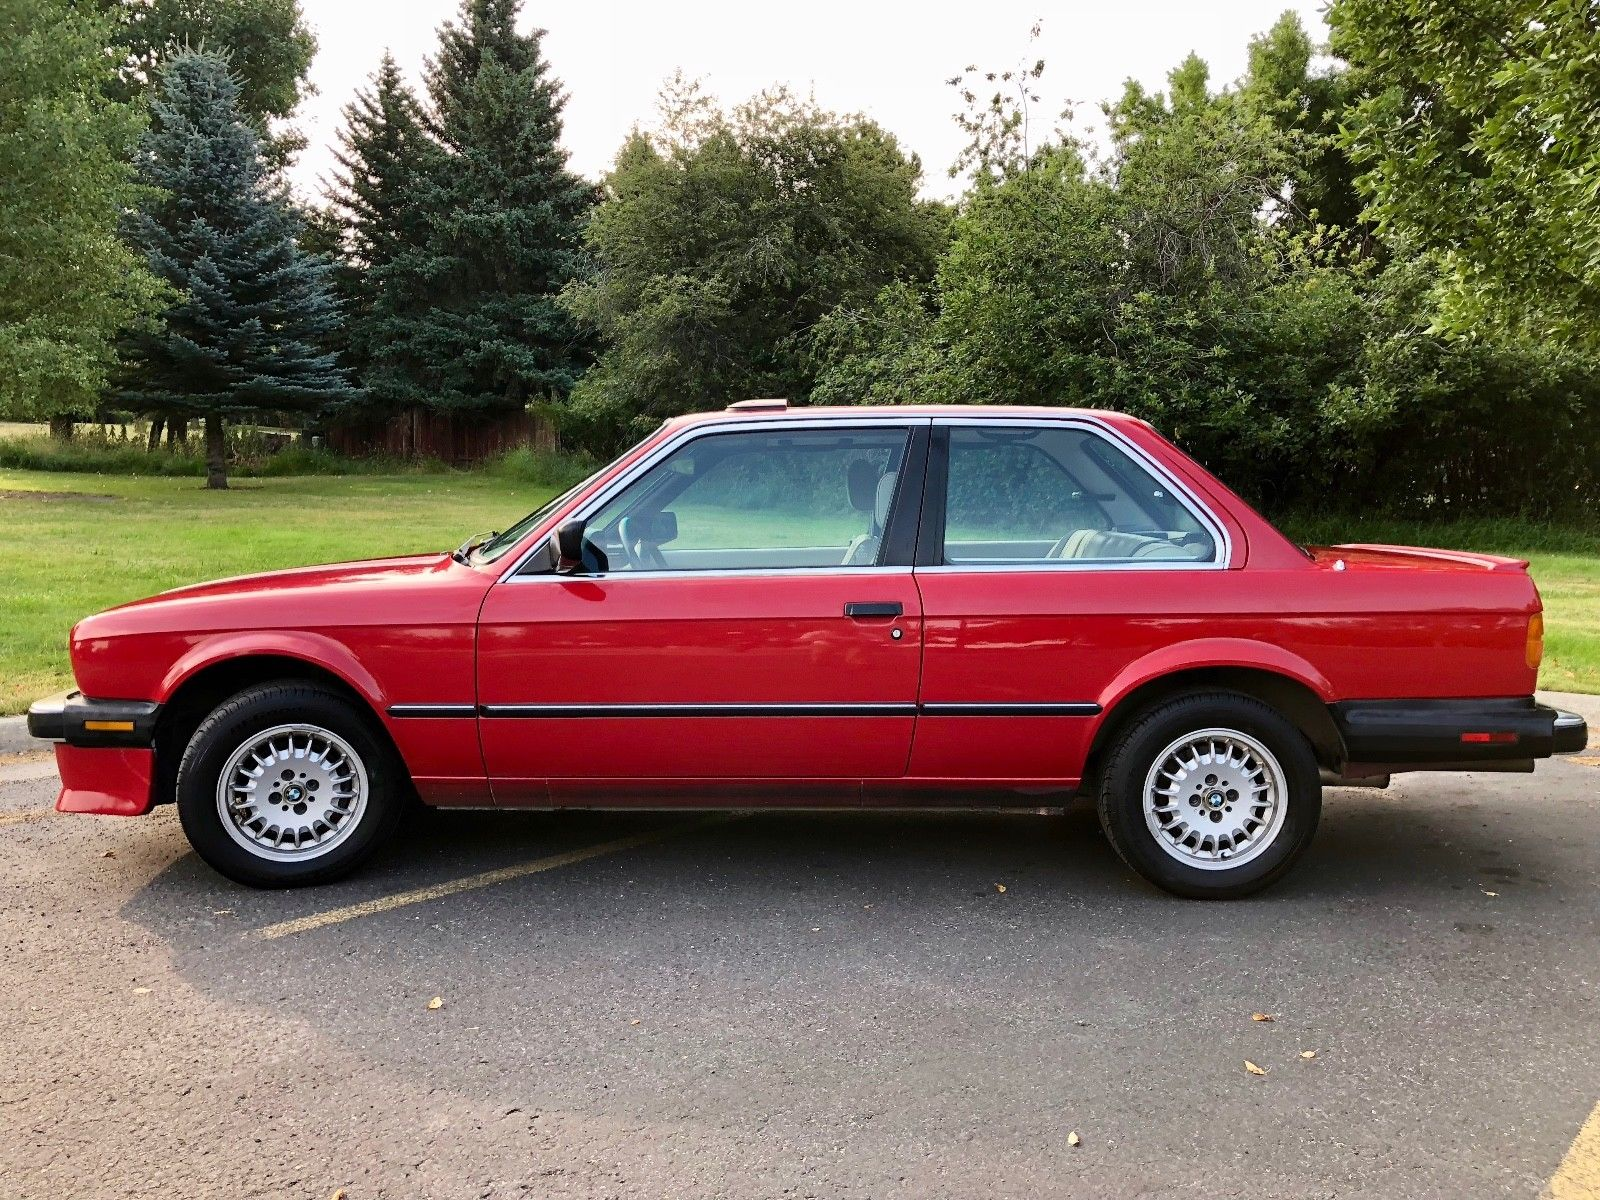 Used 1986 BMW 3-Series BMW 1986 325es E30 - Manual 5-speed ...